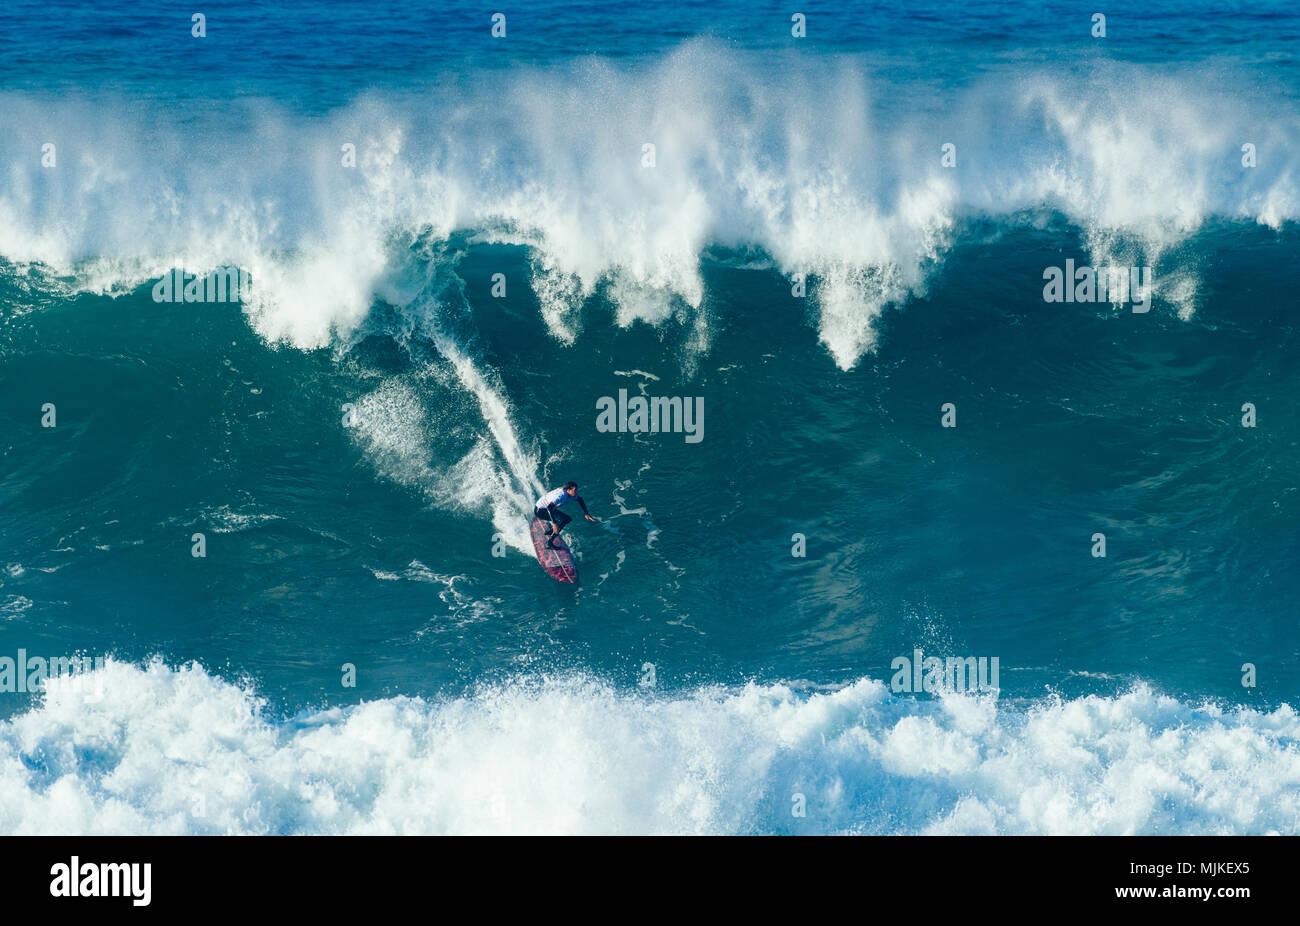 Surfer on a big wave - Stock Image